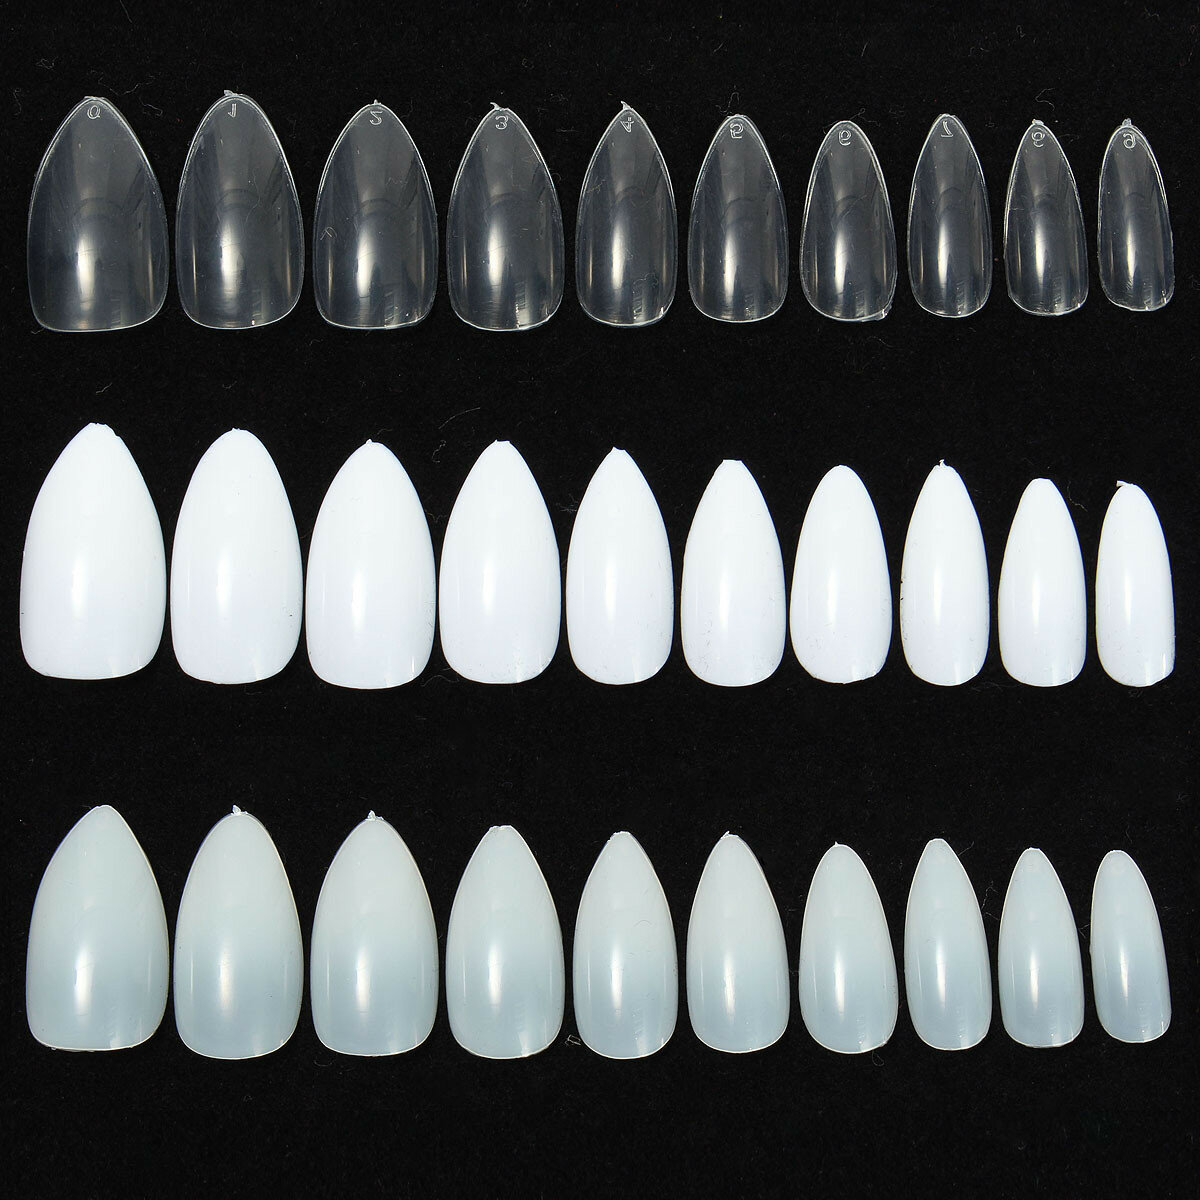 600Pcs Almond Oval Shape Stiletto Pointy False Nail Tips Acrylic Gel Polish